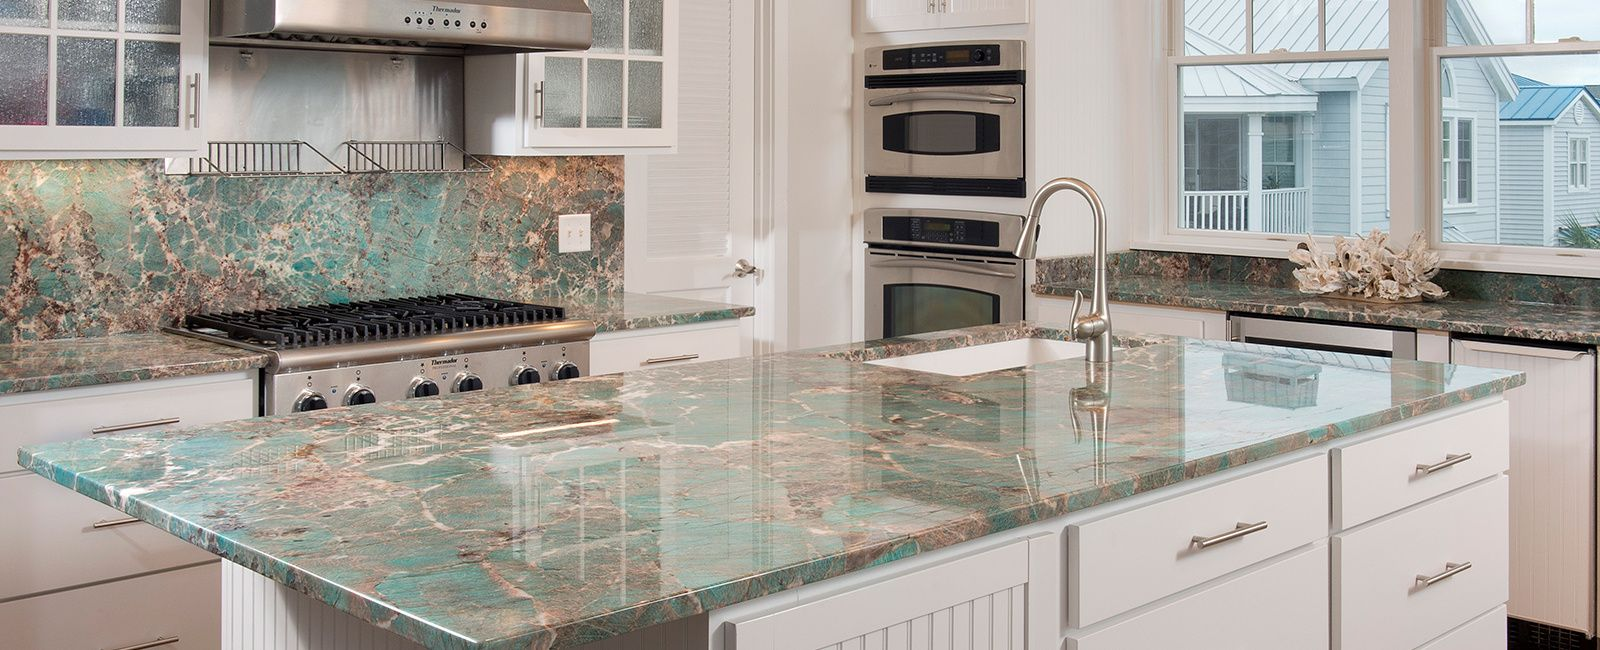 Pin by Erlangfahresi on granite countertops colors | Quartz ...